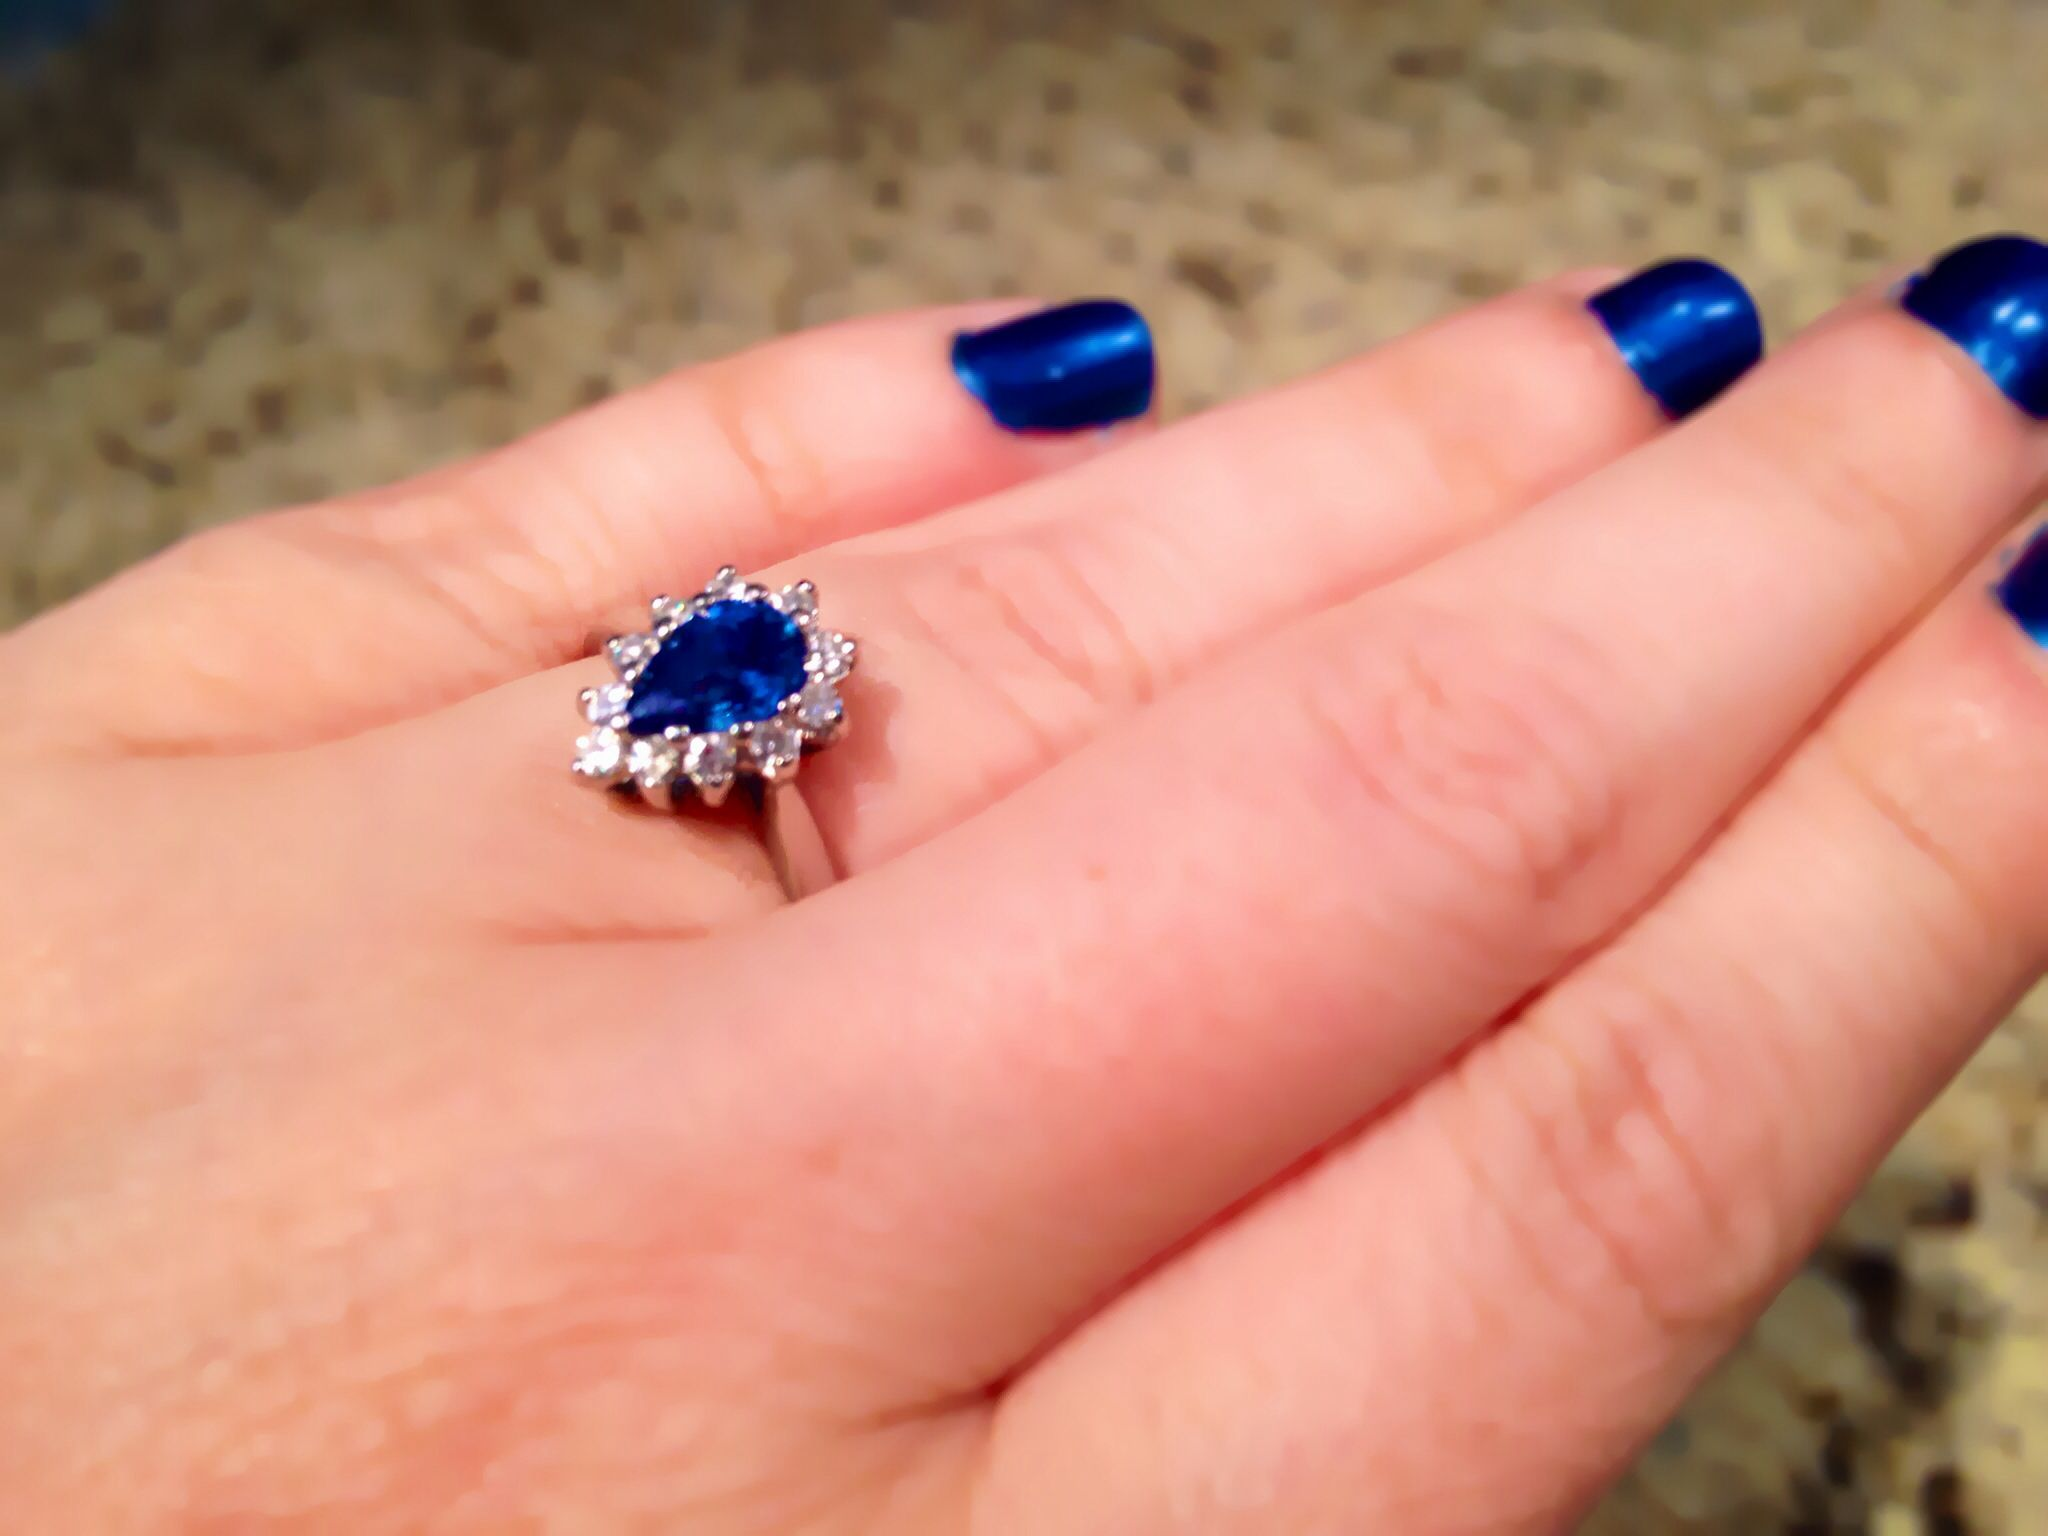 Pin by Jacynthe Kelly on My travel themed wedding | Pinterest | Blue ...